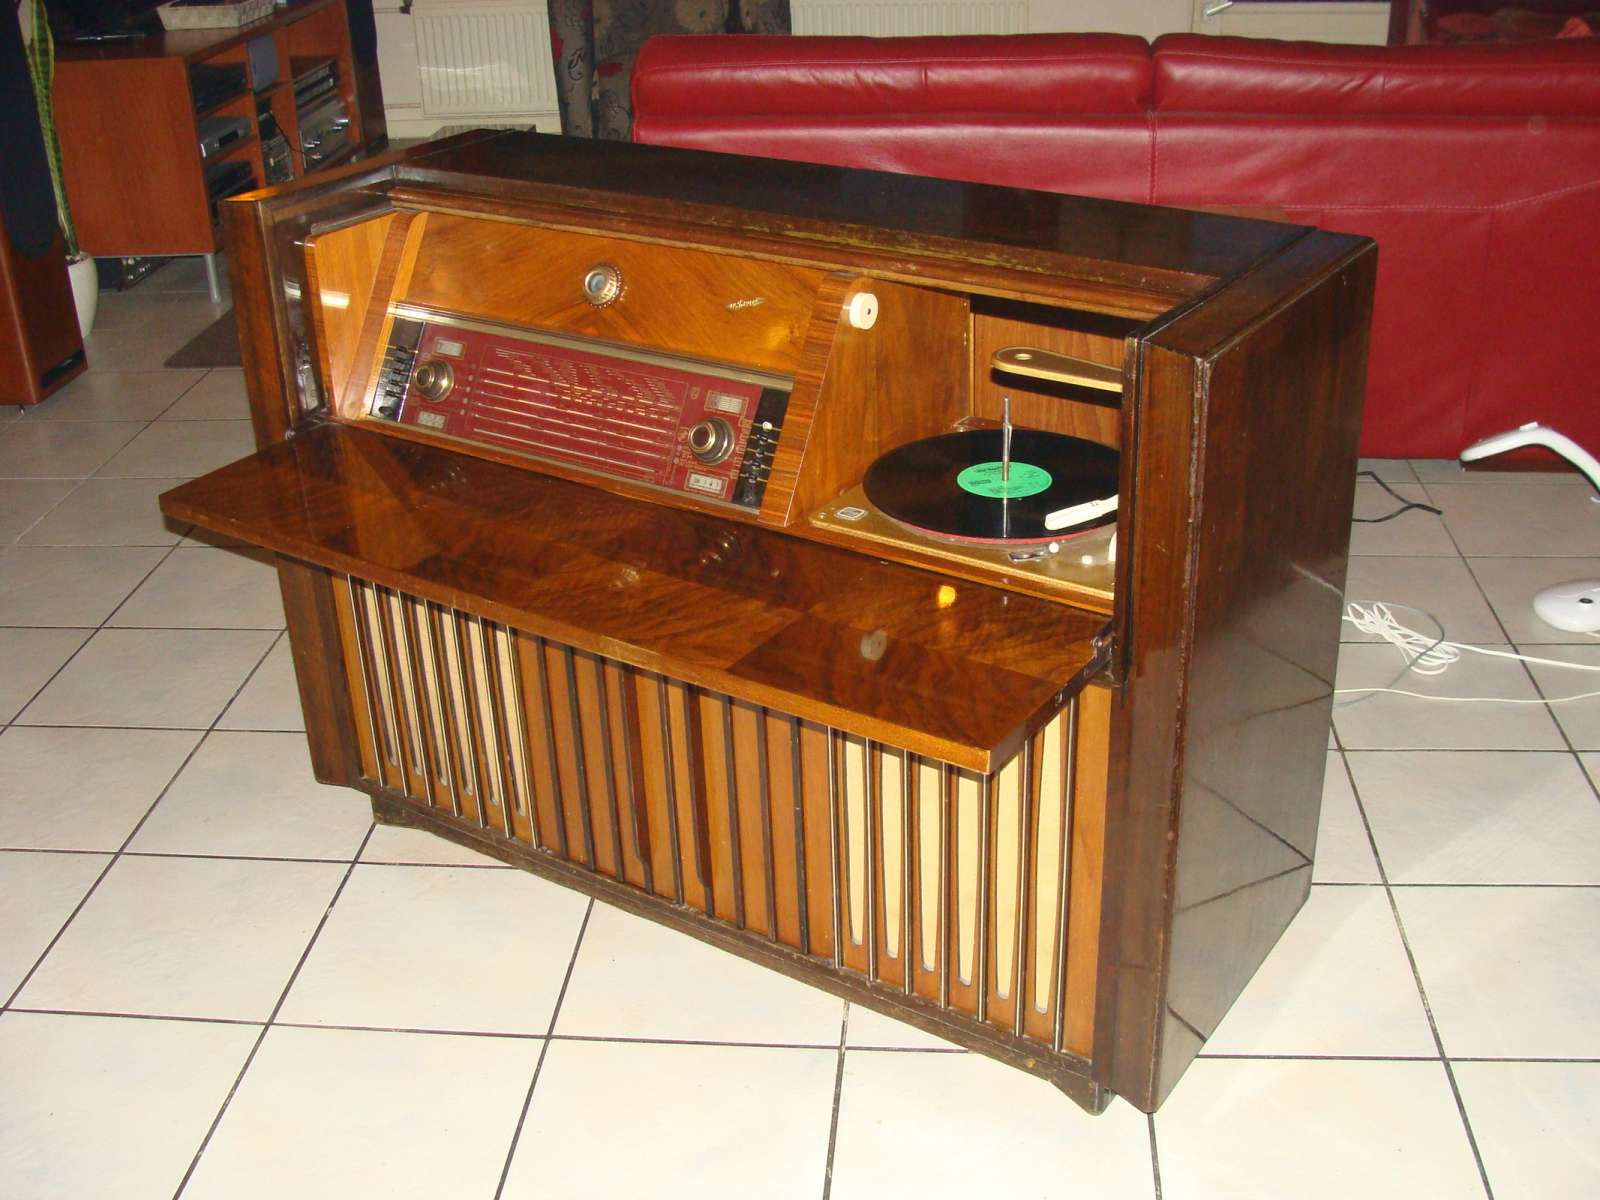 Tv Radio Meubel : Aanschaf fx a radiomeubel pagina buizenradioclub